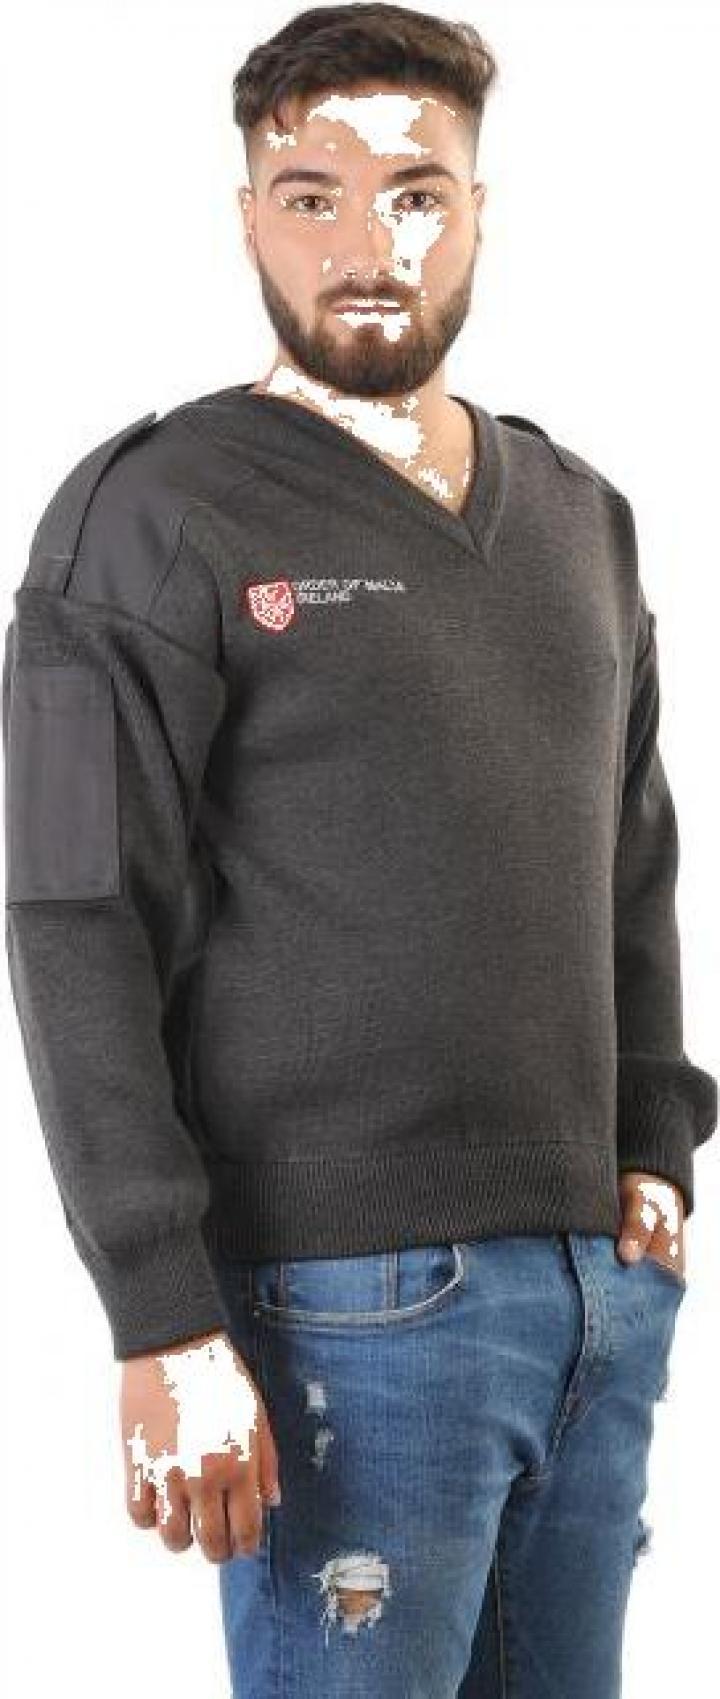 Pulover tricotat cu platca, cotiere si epoleti